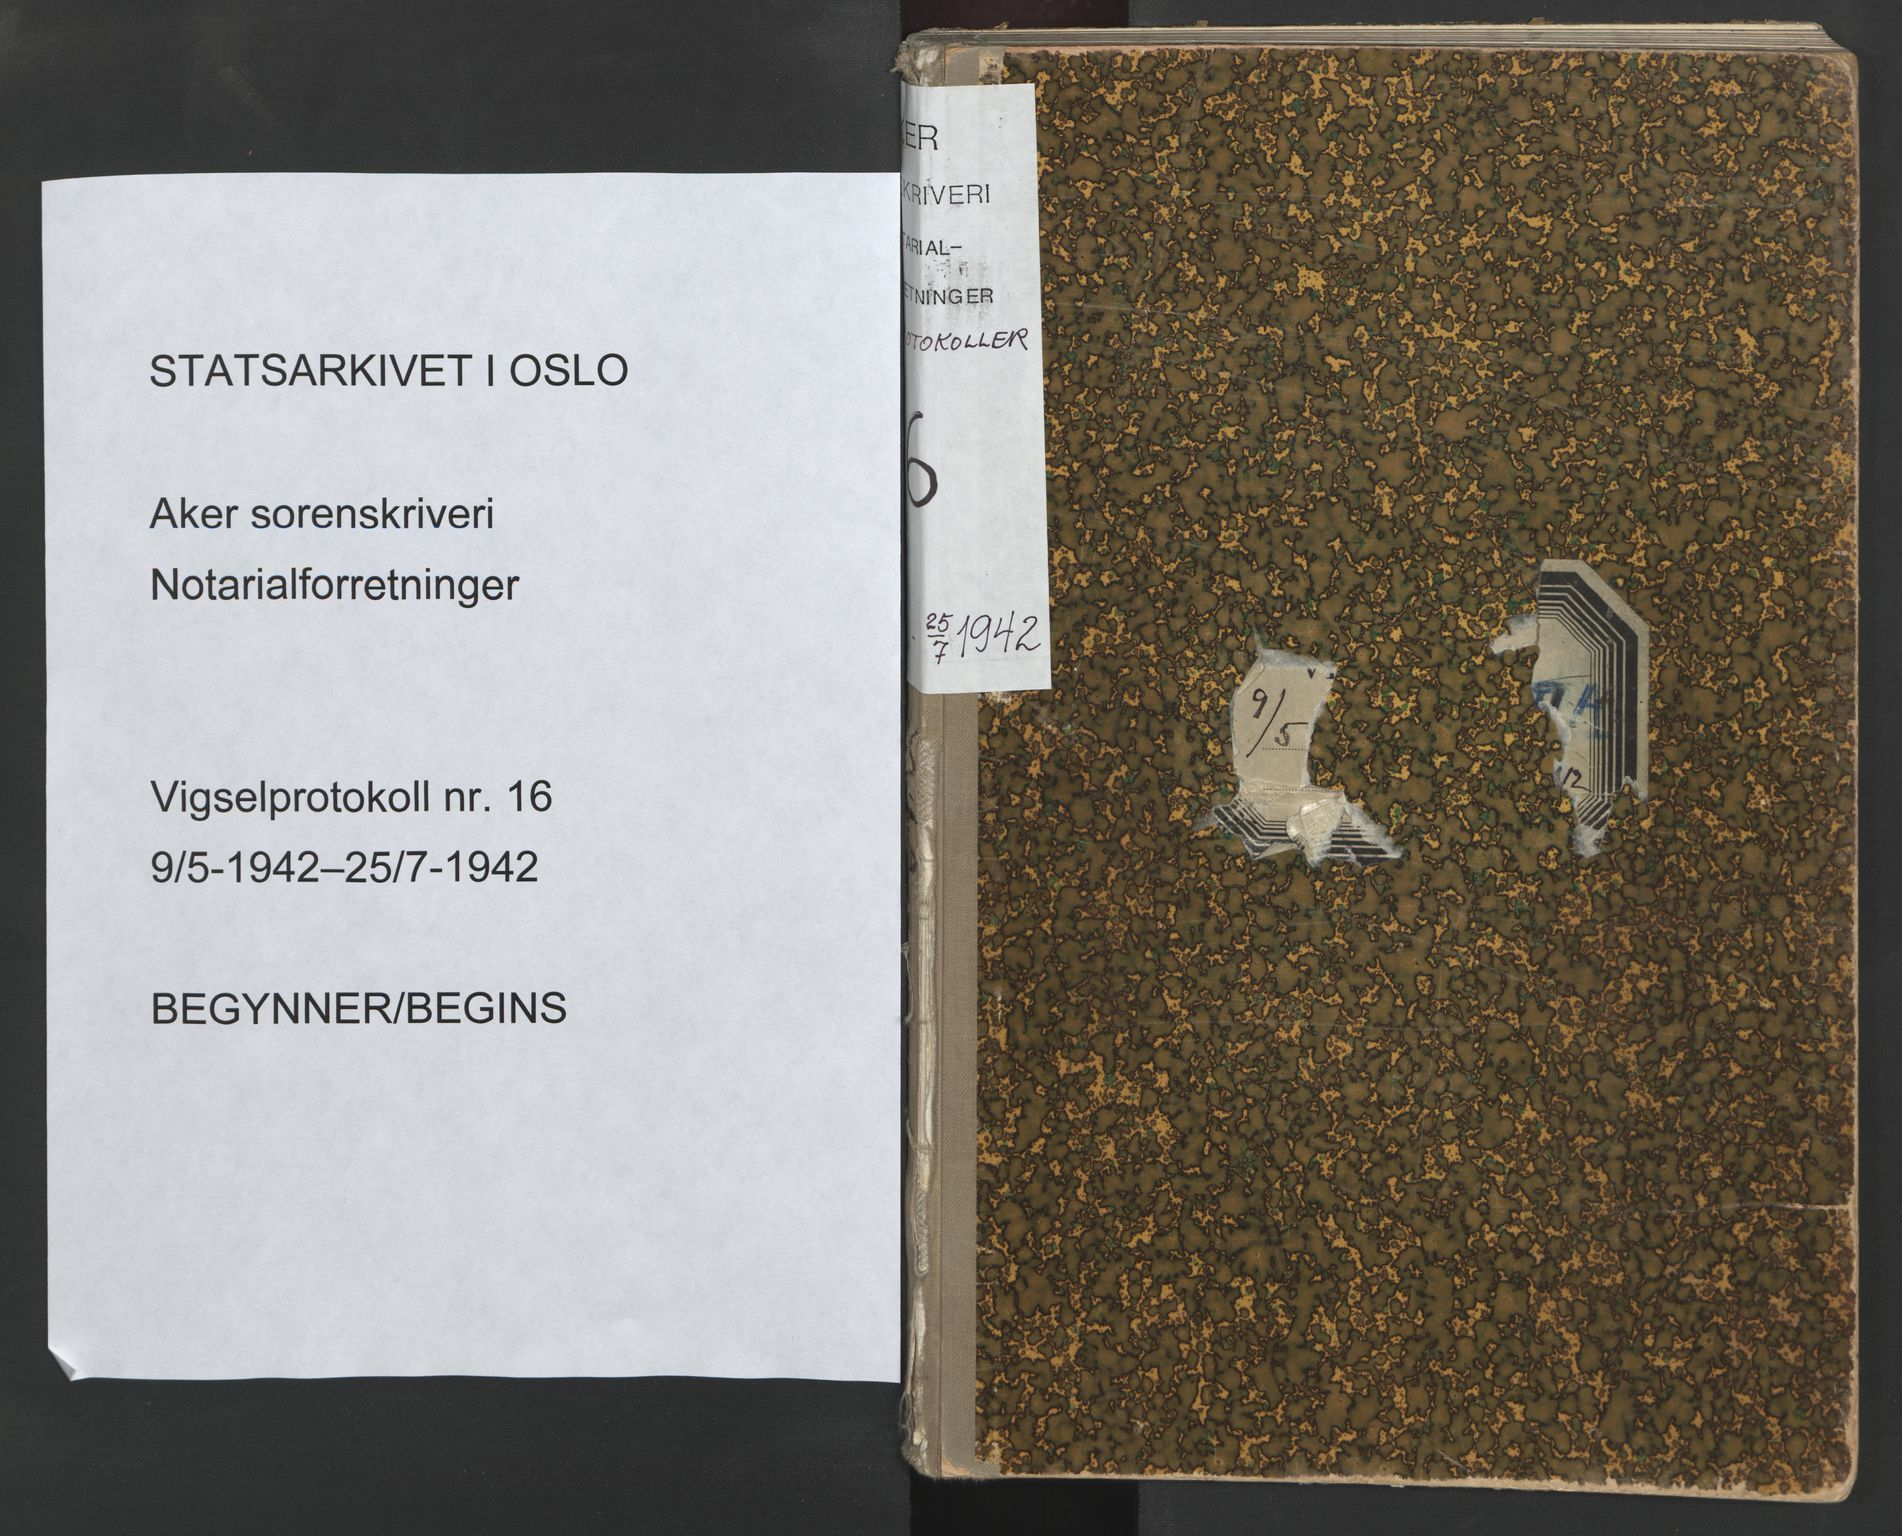 SAO, Aker sorenskriveri, L/Lc/Lcb/L0016: Vigselprotokoll, 1942, s. upaginert